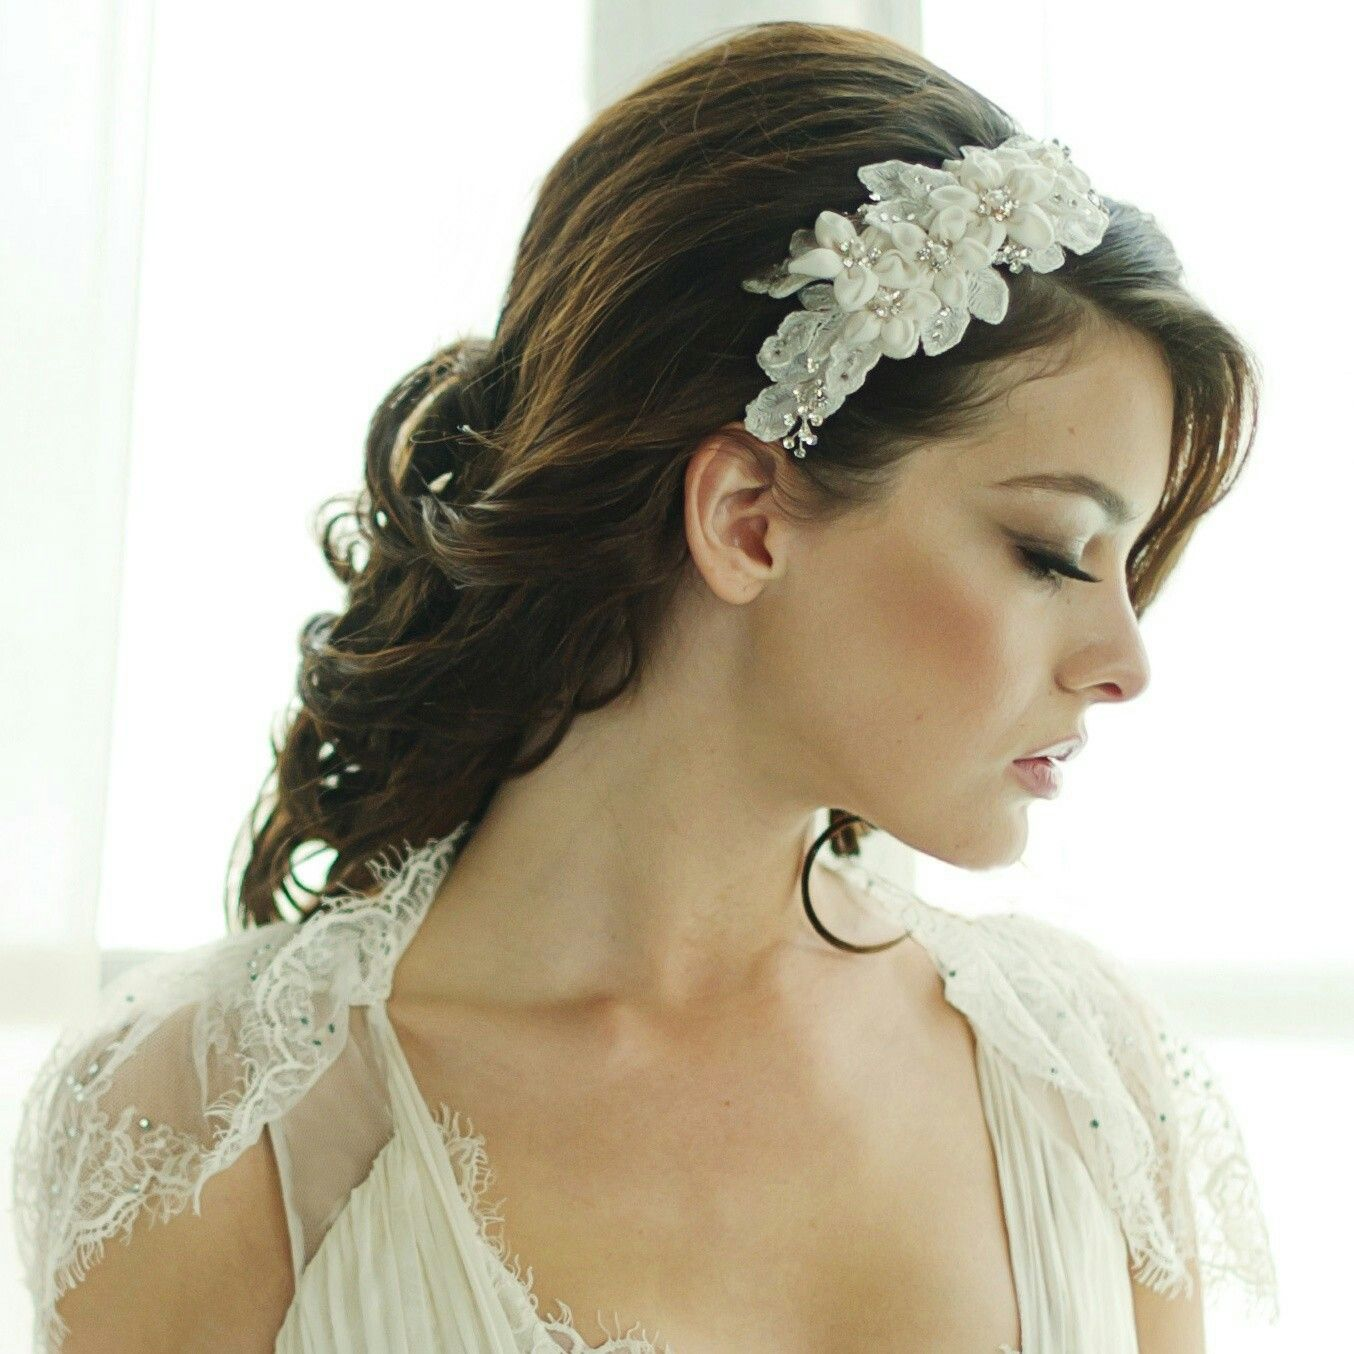 pin by maha almusawi on hair | floral headband wedding